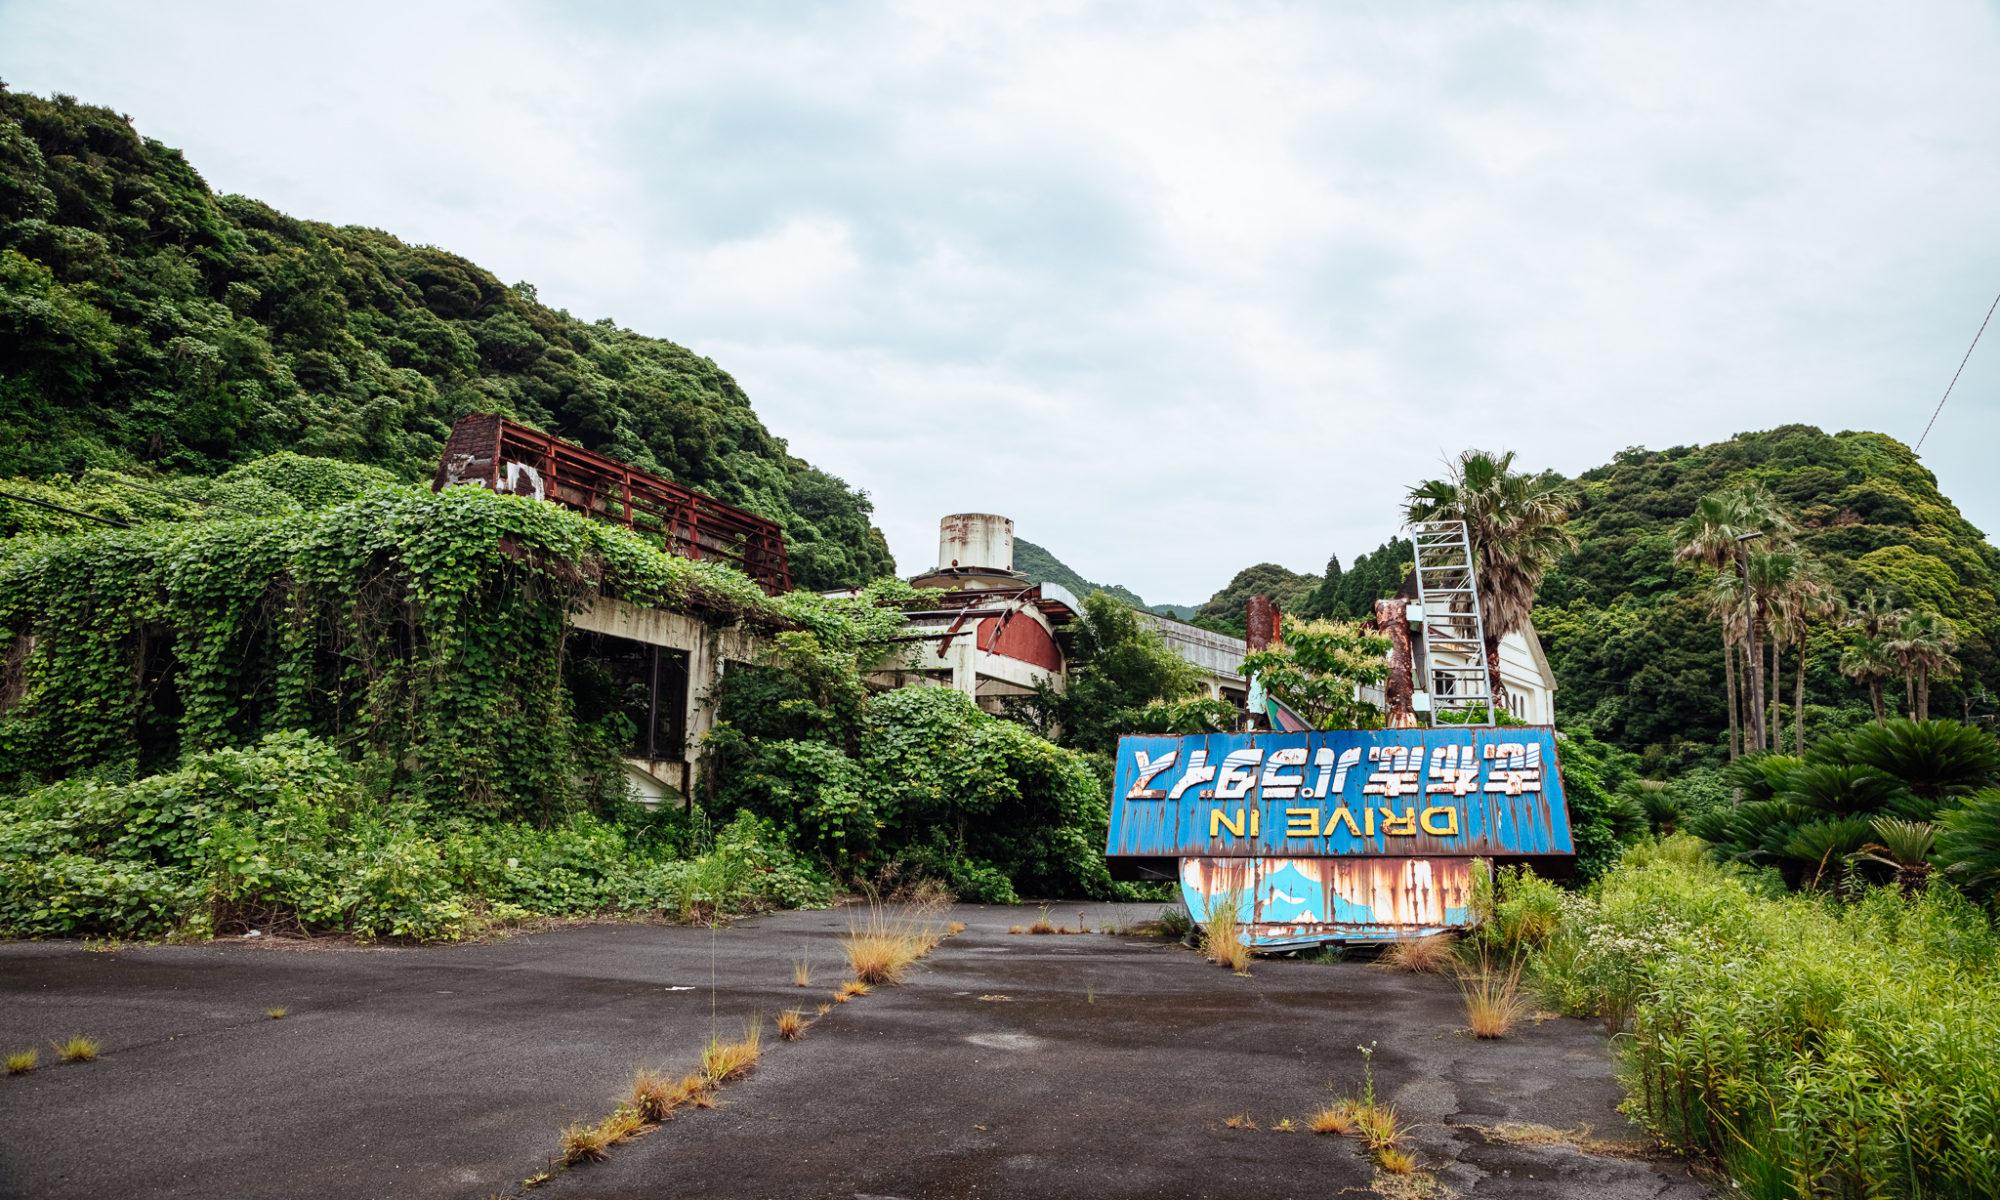 FW2021 美しい日本の景色を探そう